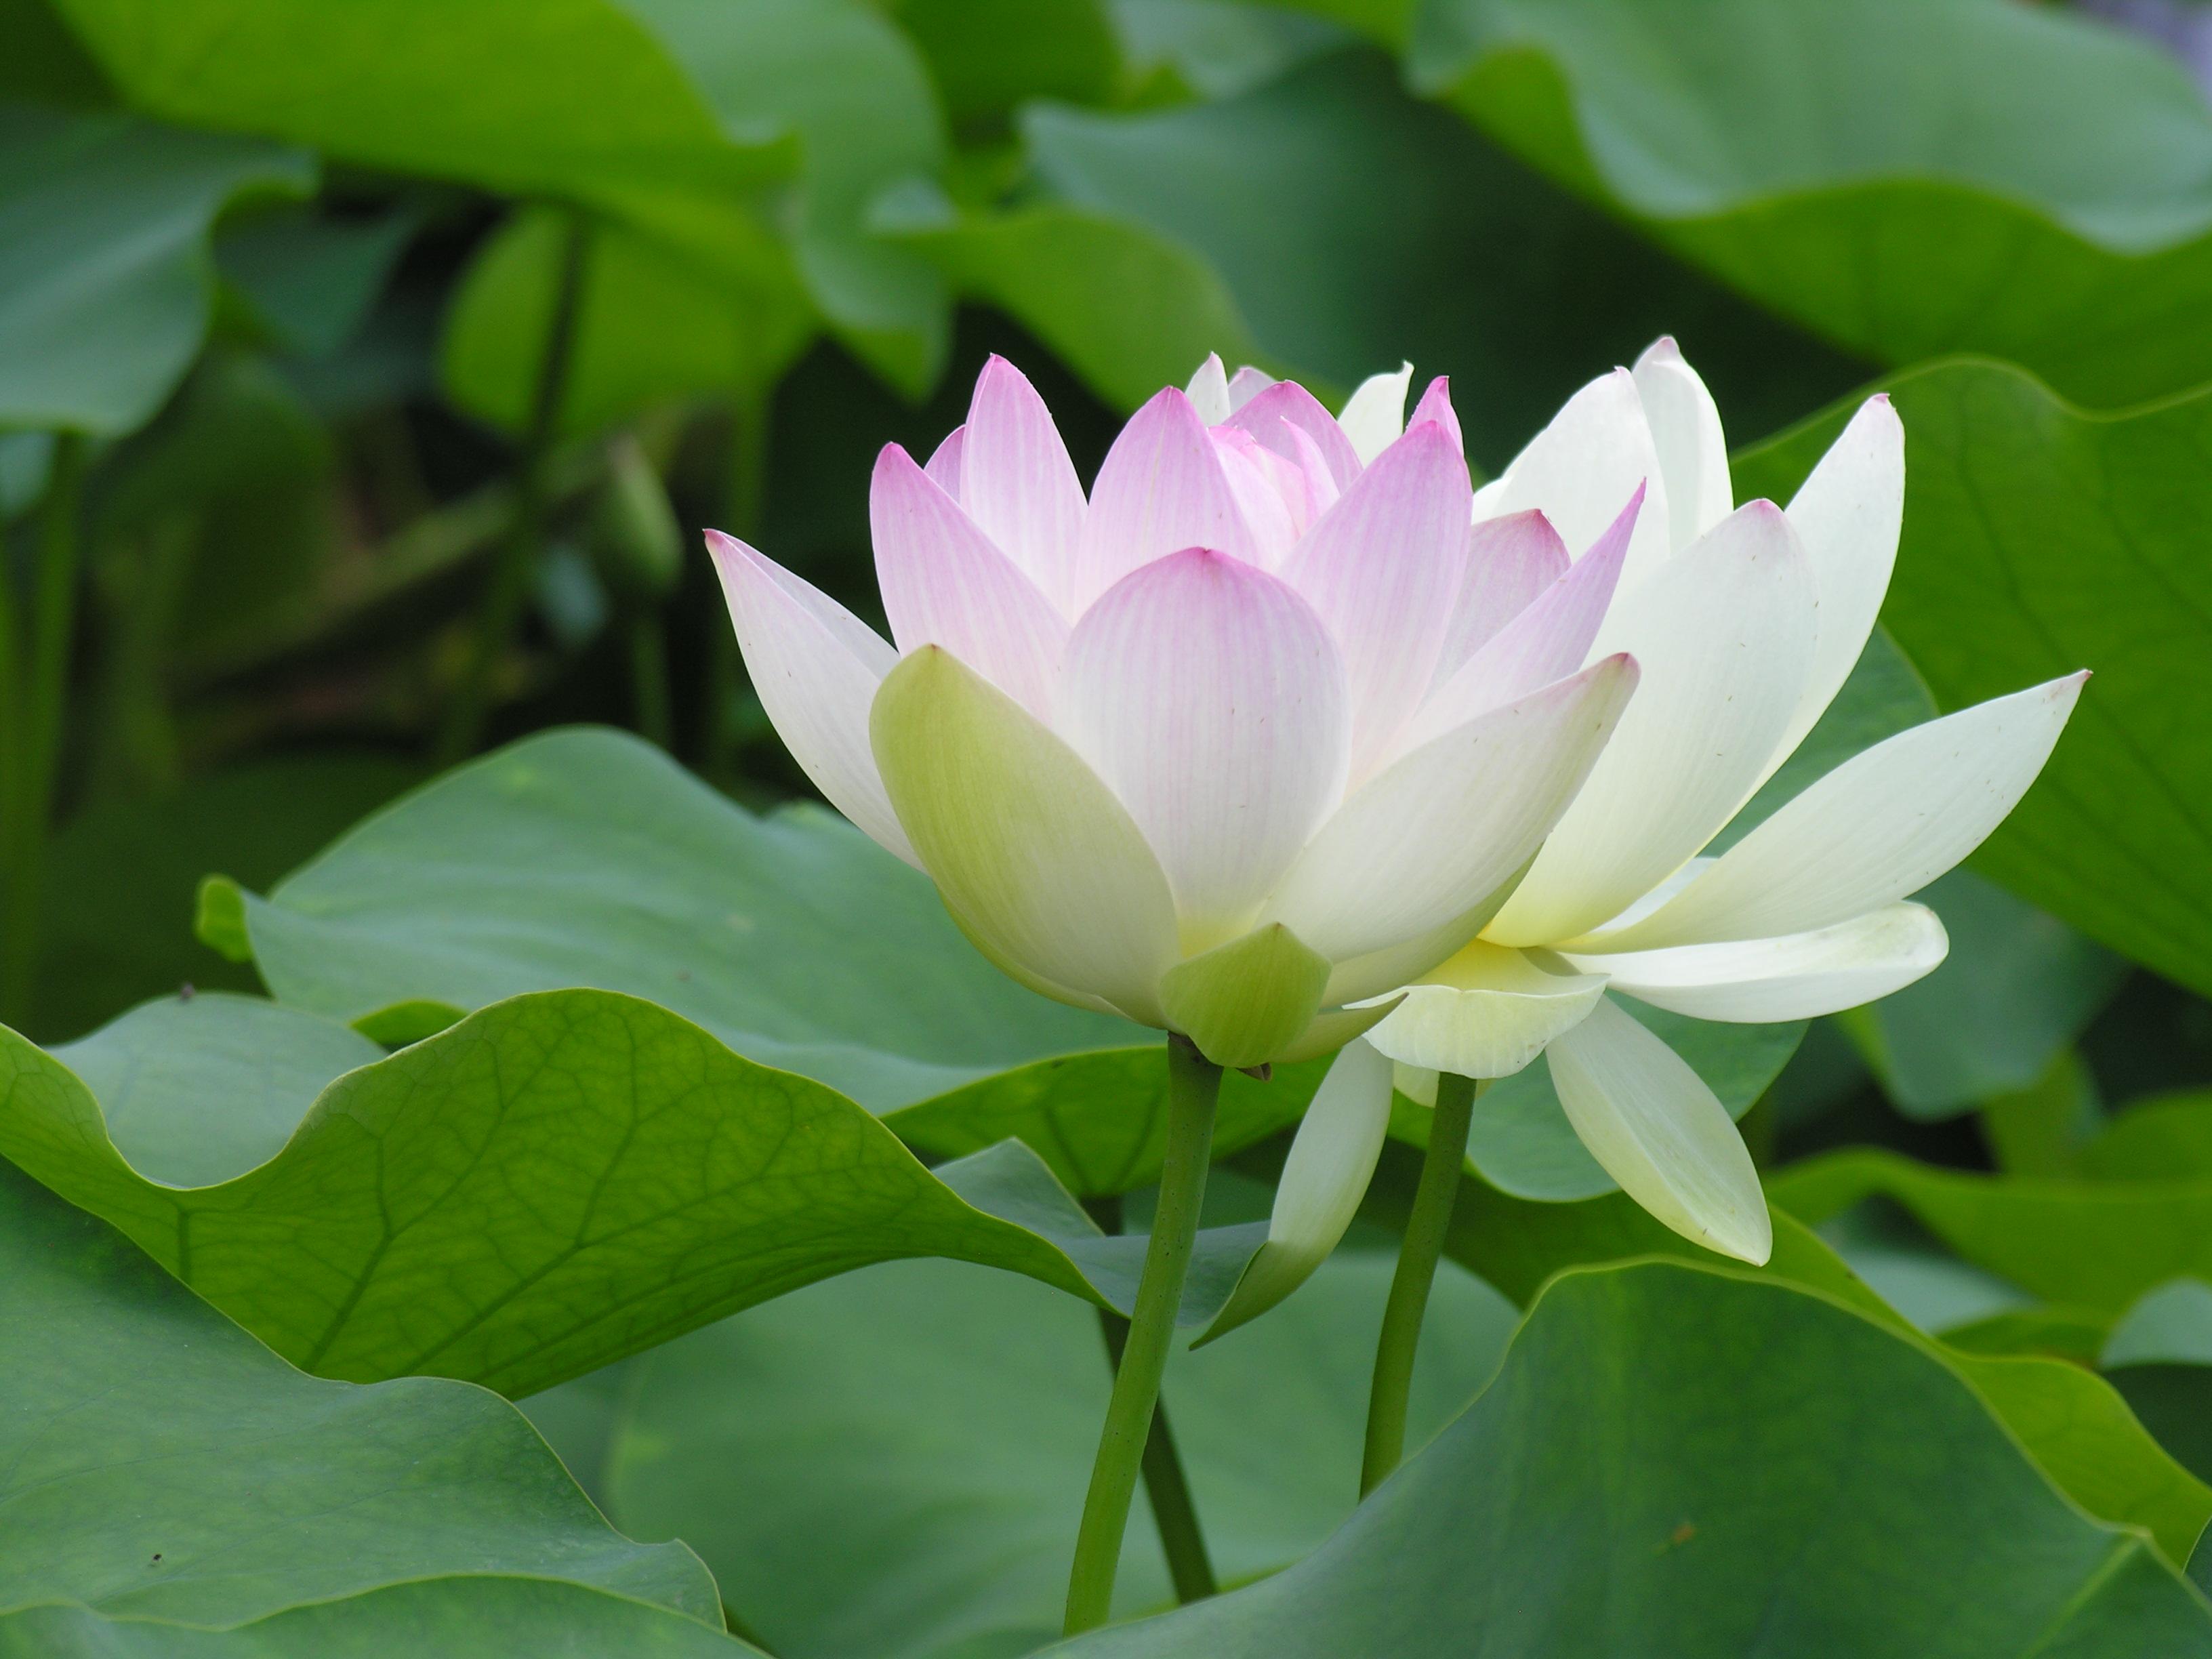 nguồn gốc hoa sen